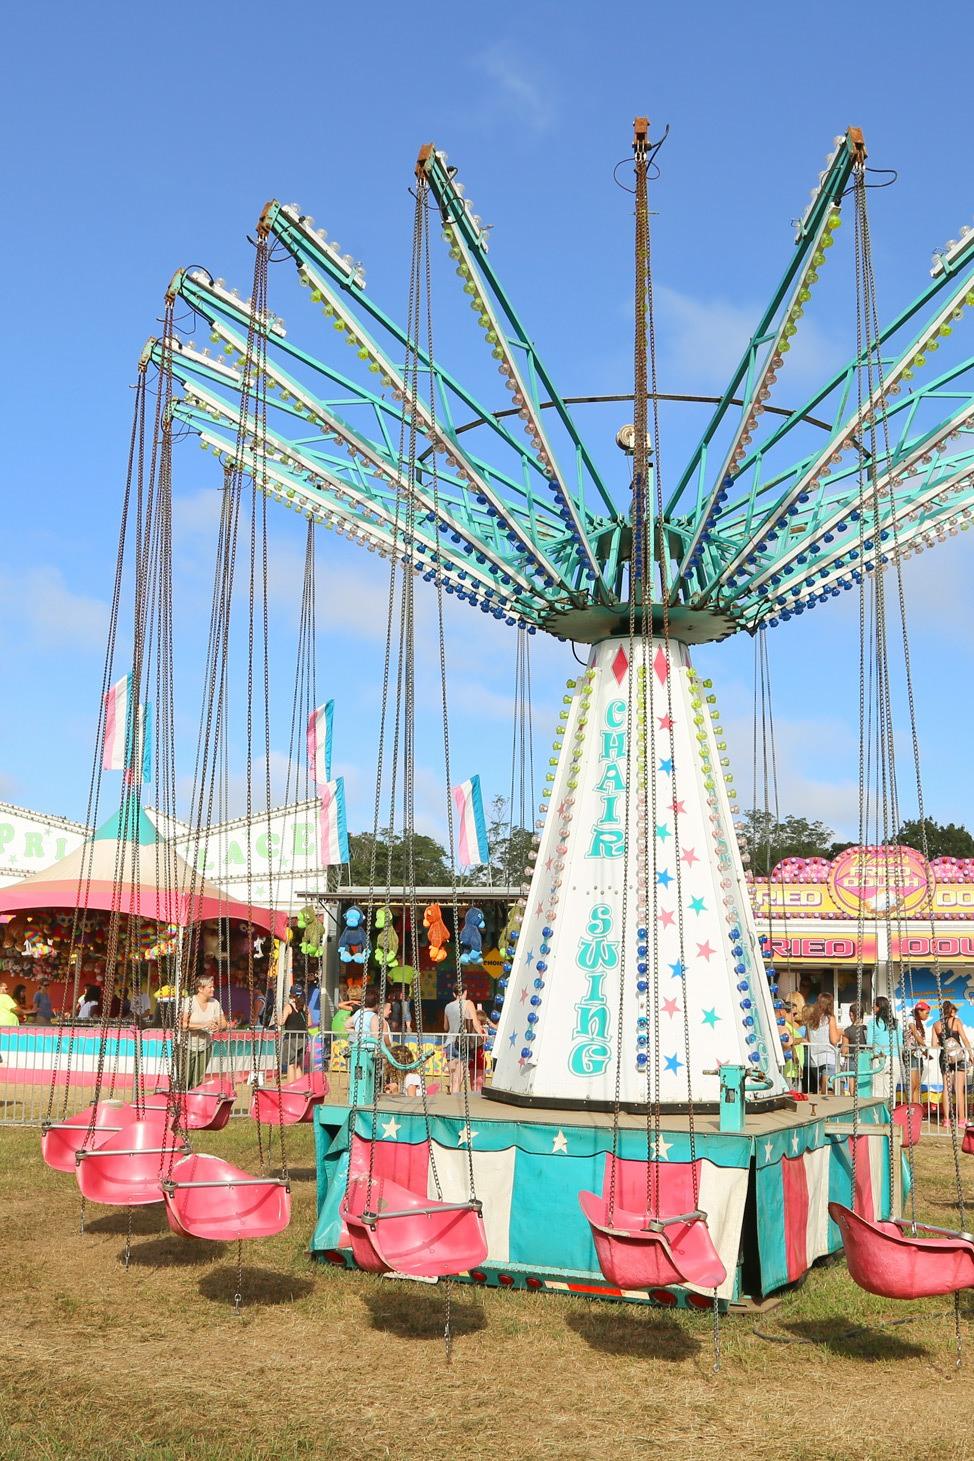 Carnival Rides at The Martha's Vineyard Agricultural Society Ag Fair